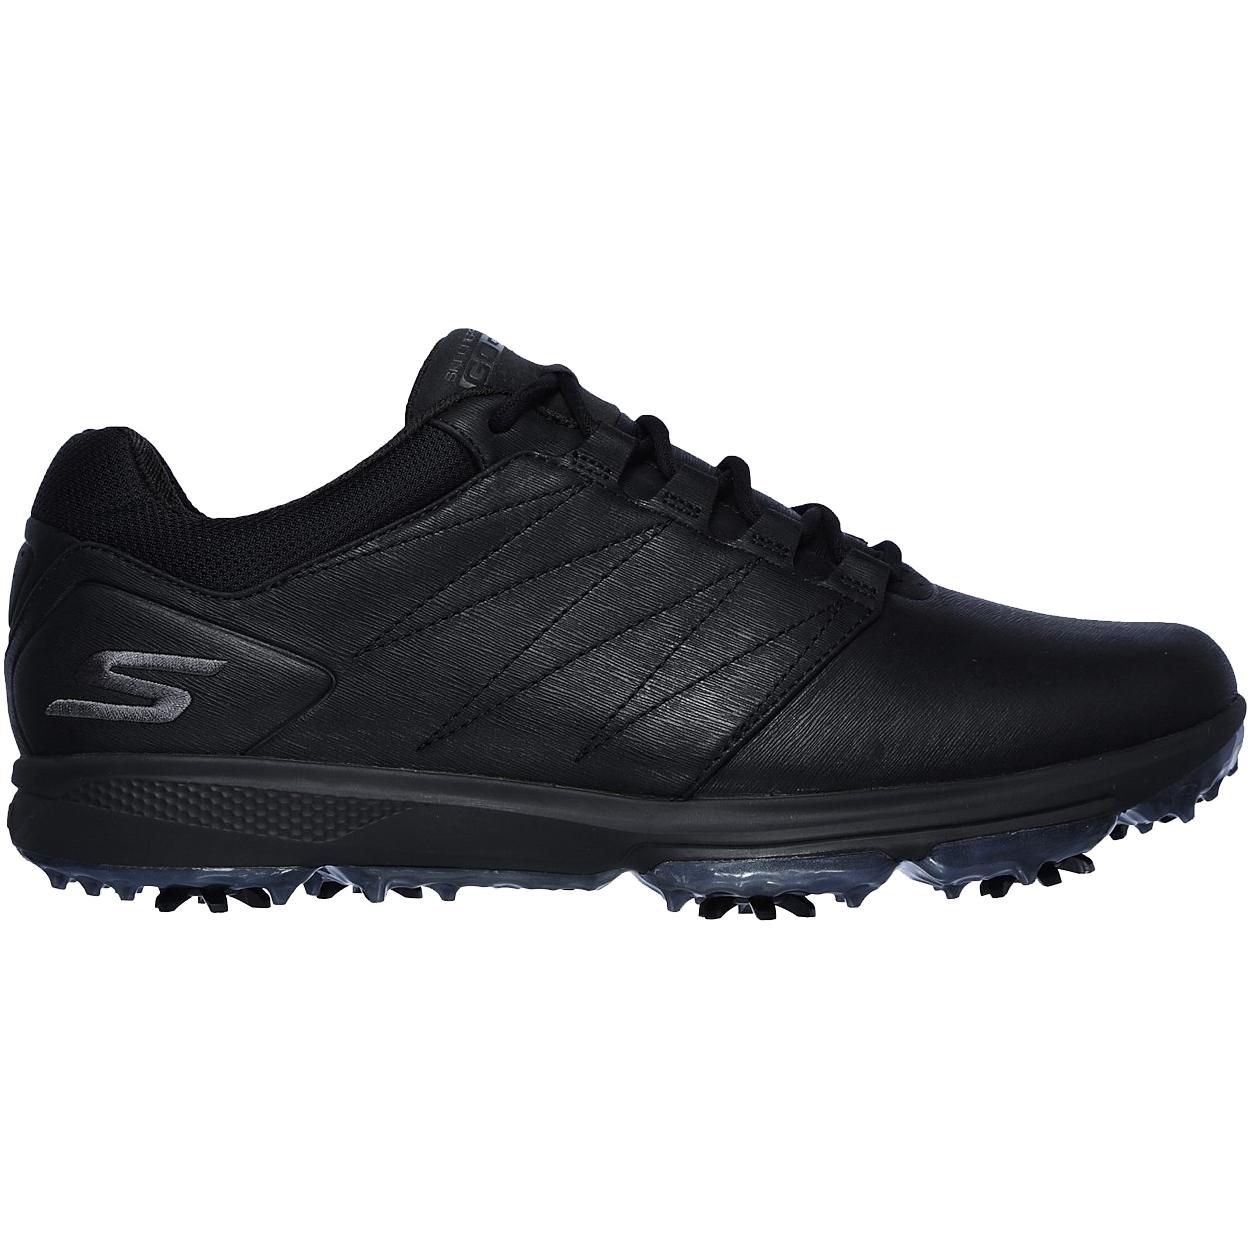 Skechers-Men-039-s-GOgolf-Pro-4-LX-Leather-Golf-Shoe-Brand-New thumbnail 10